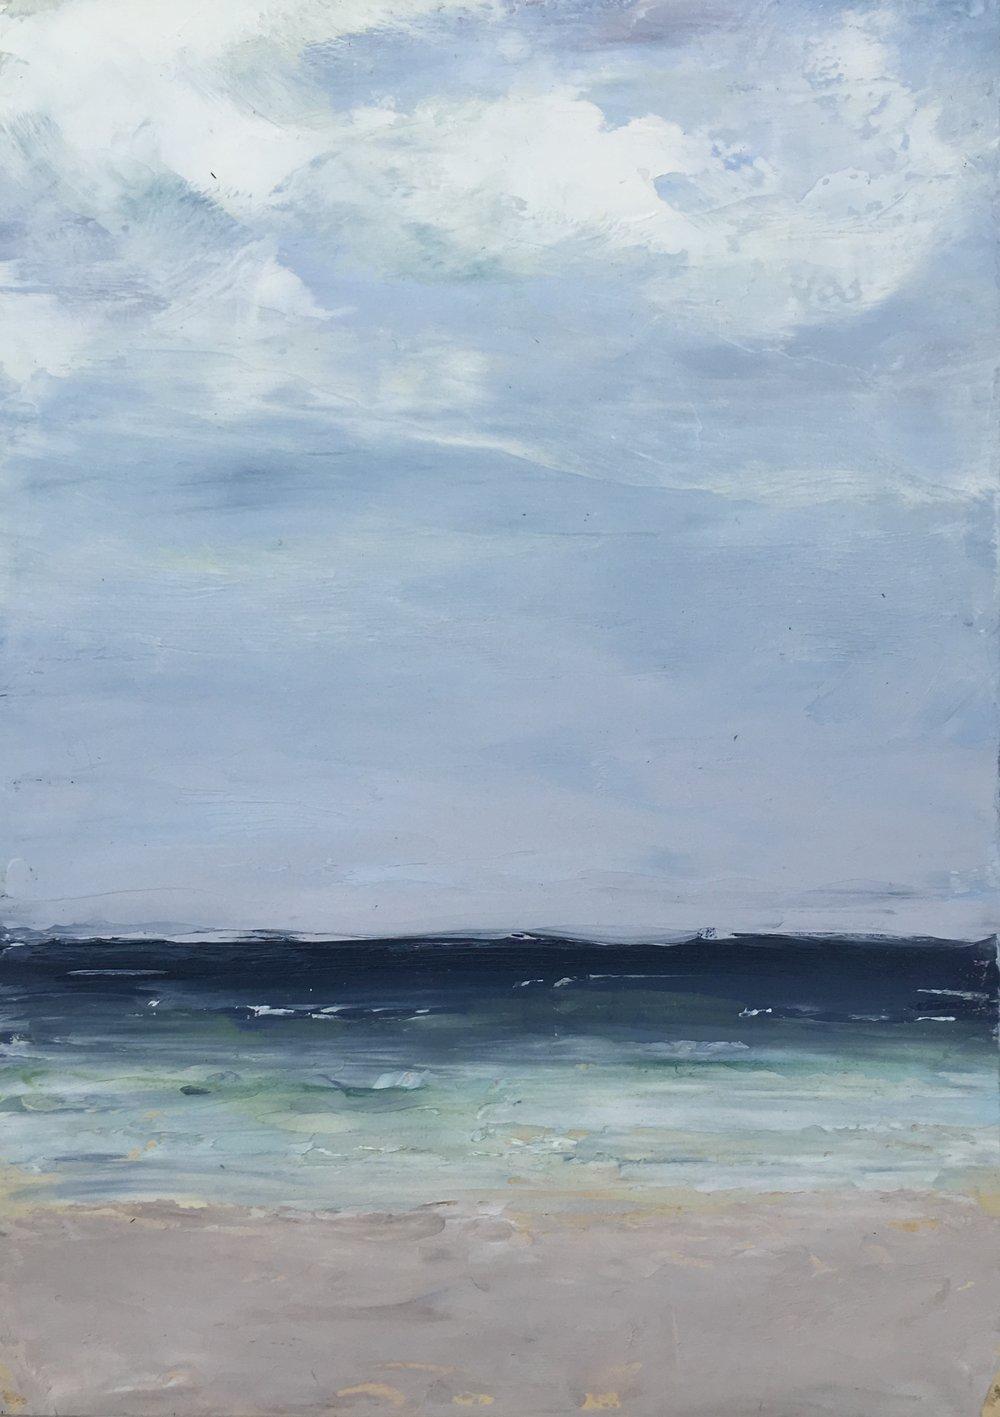 Seascape 8; oil on canvas; 5 x 7